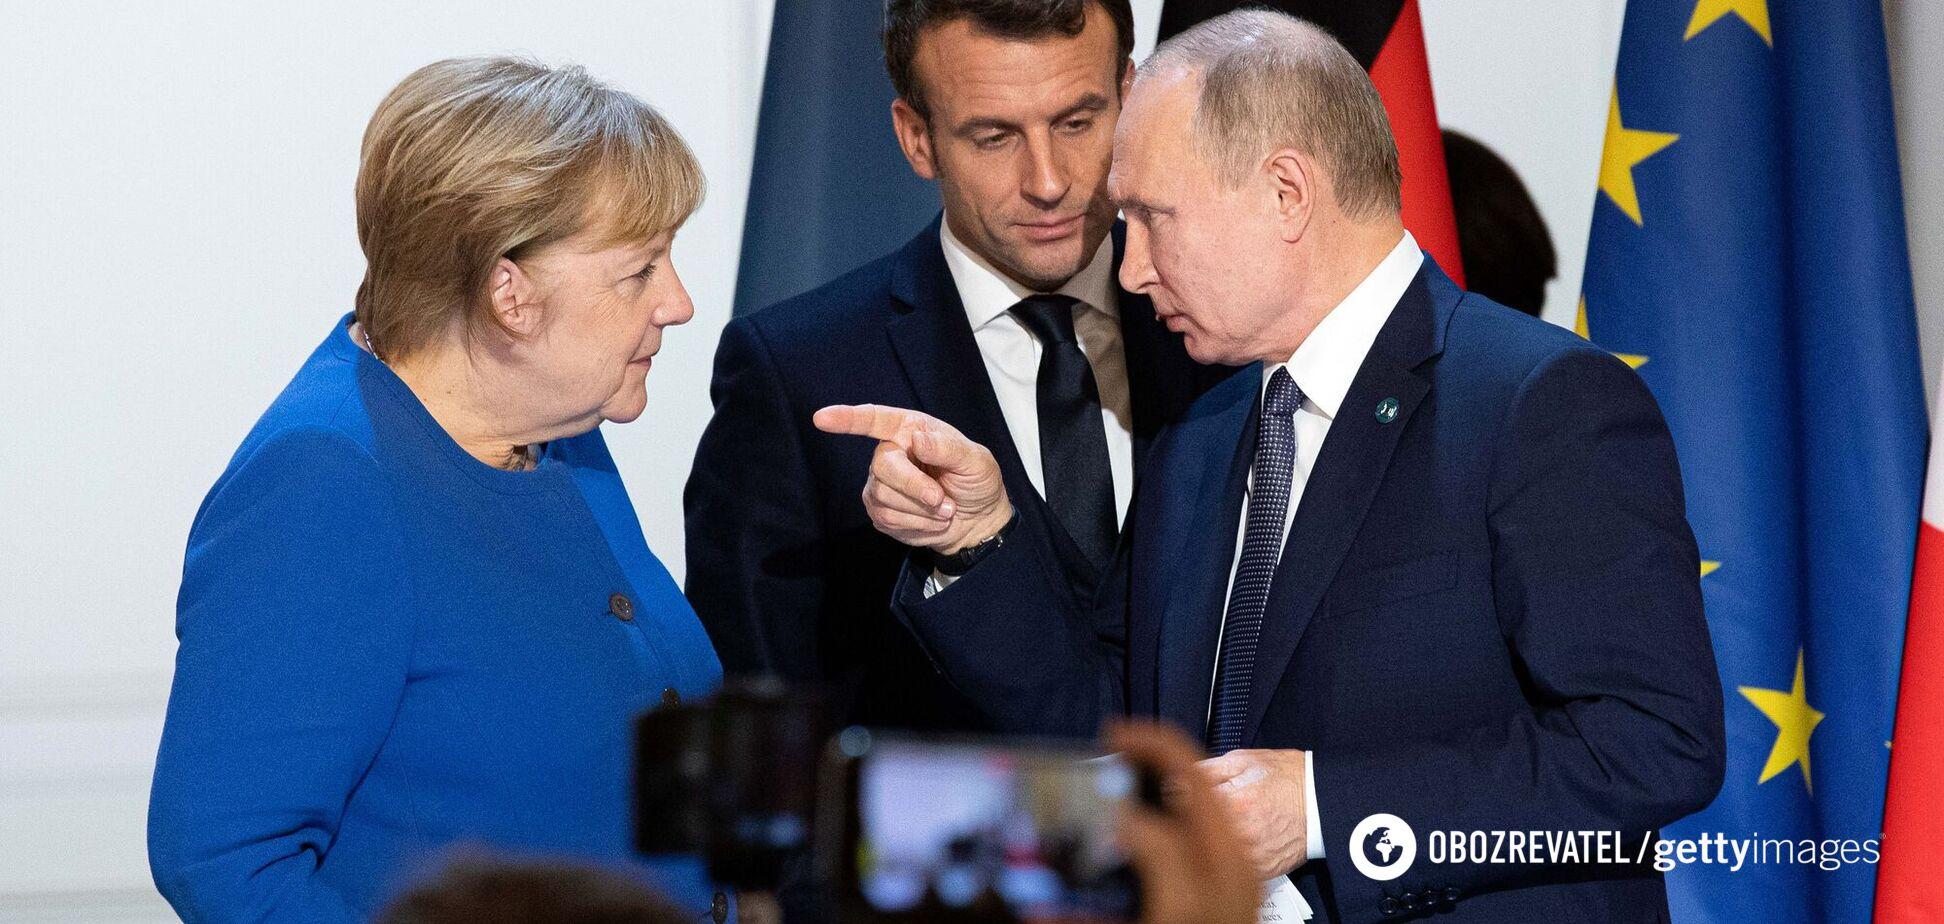 Ангела Меркель, Эммануэль Макрон и Владимир Путин